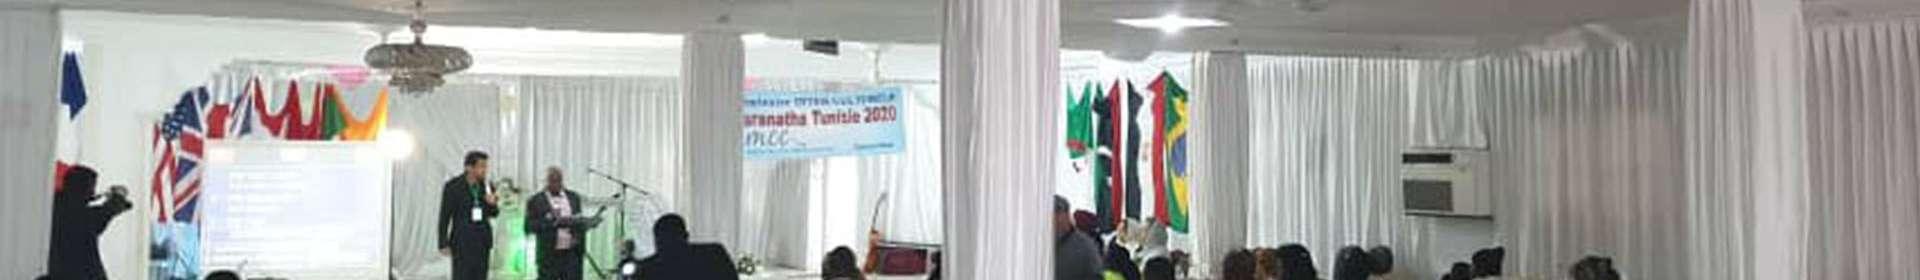 Igreja Cristã Maranata realiza seminário em Tunísia, país norte-africano